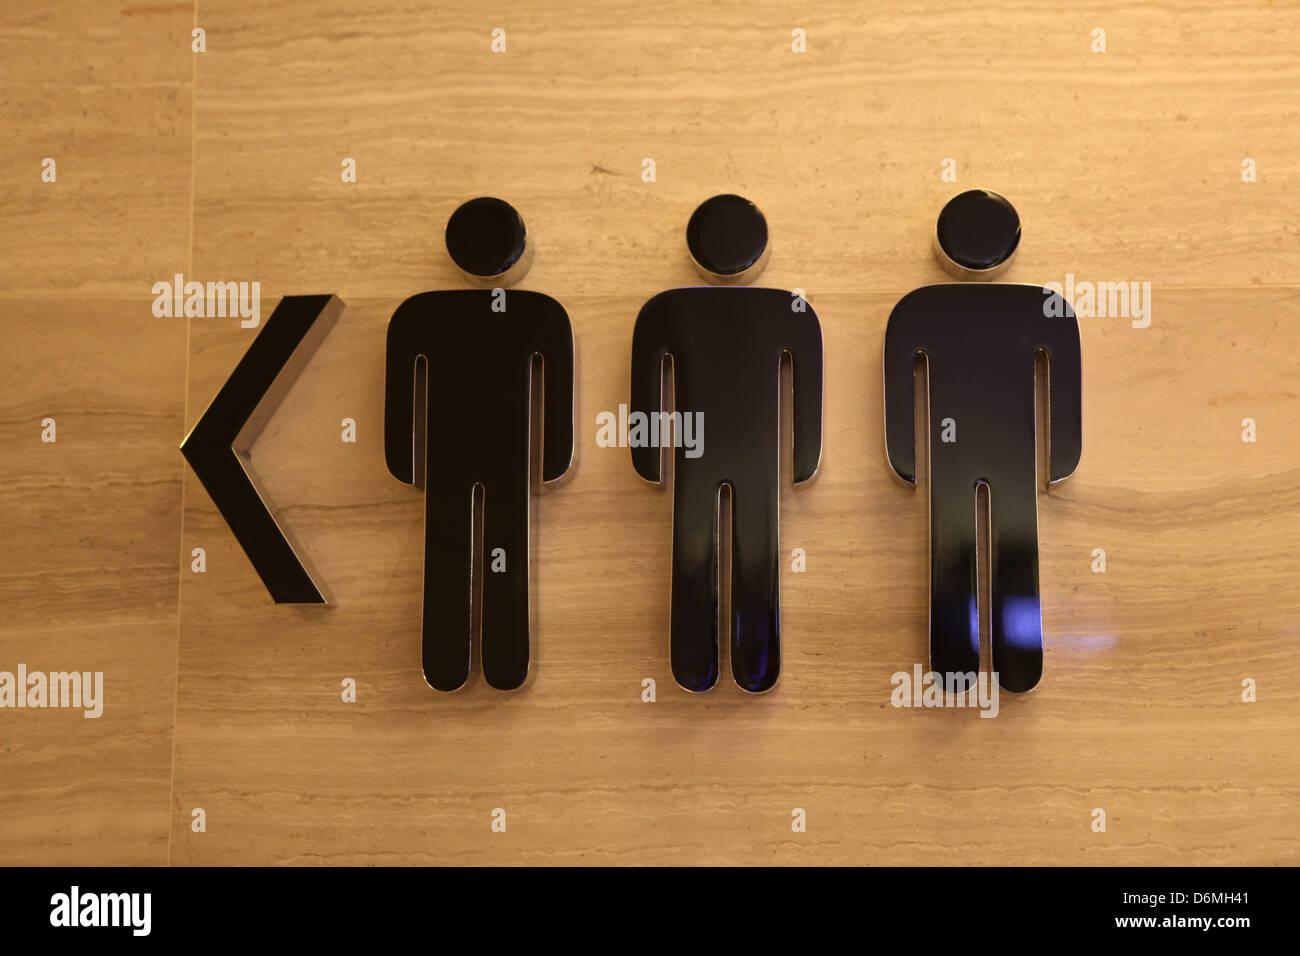 Hong Kong, China, pictogram men's rooms left - Stock Image